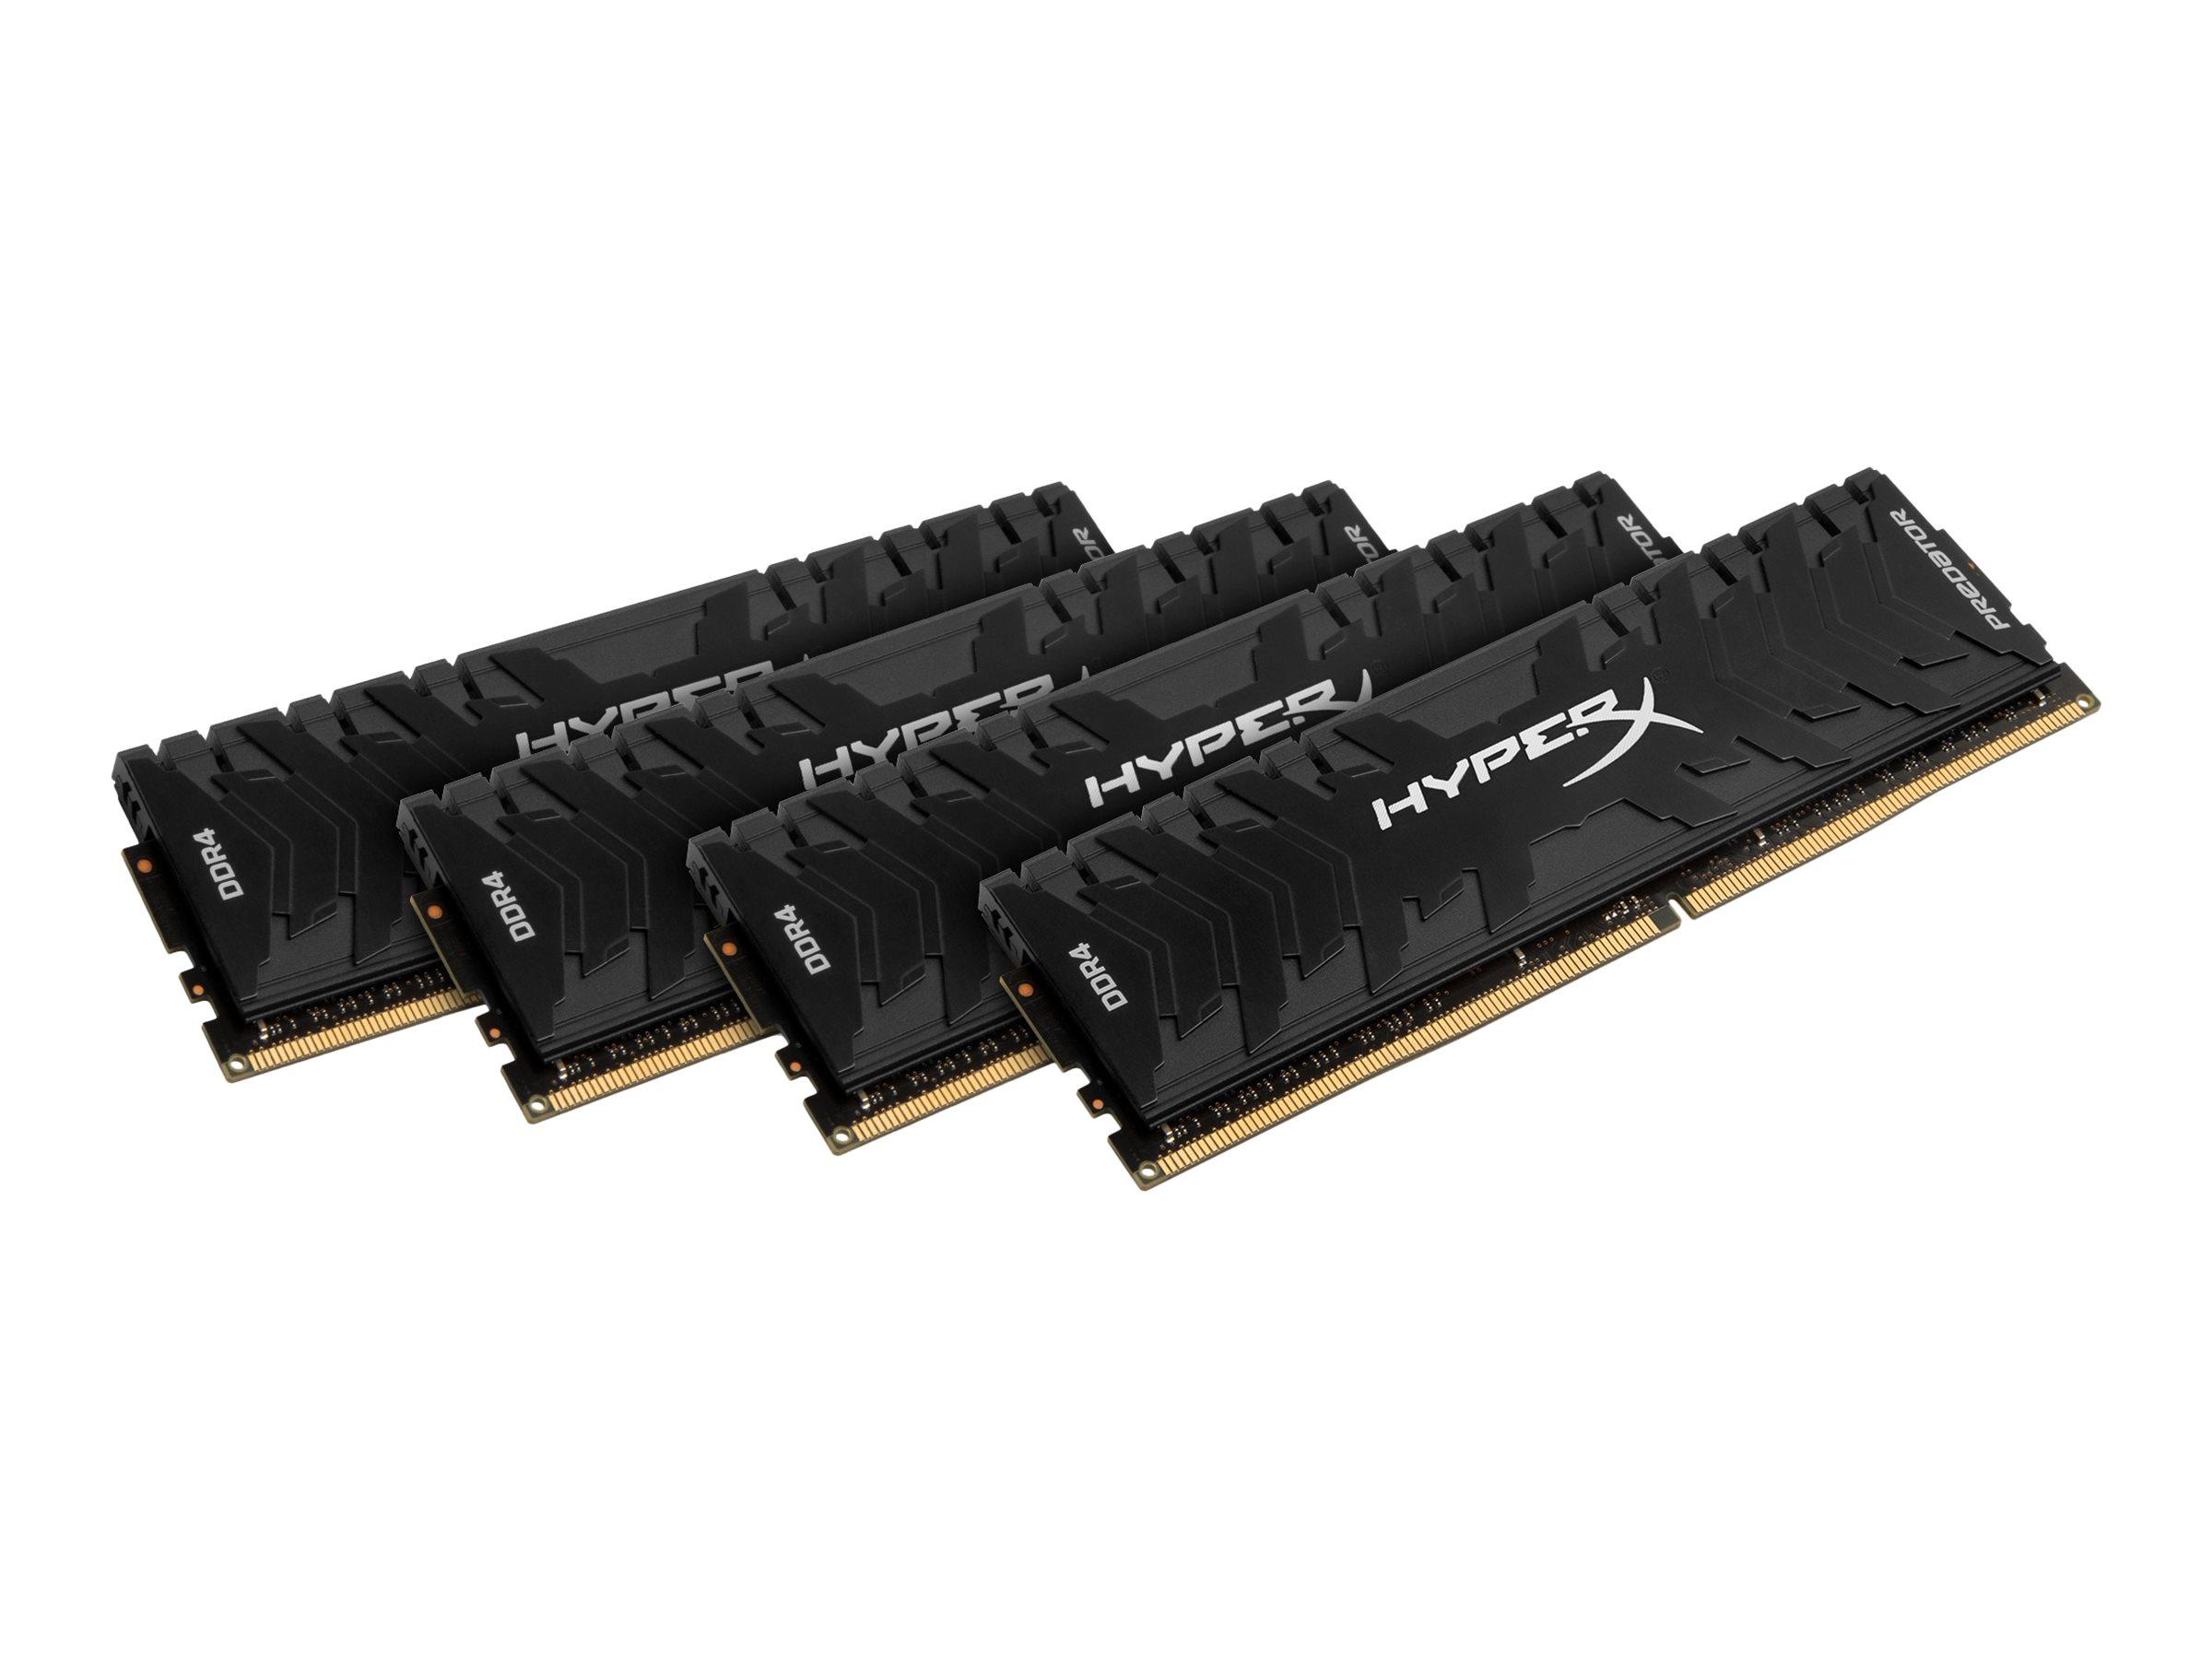 HyperX Predator - DDR4 - 128 GB: 4 x 32 GB - DIMM 288-PIN - 3000 MHz / PC4-24000 - CL16